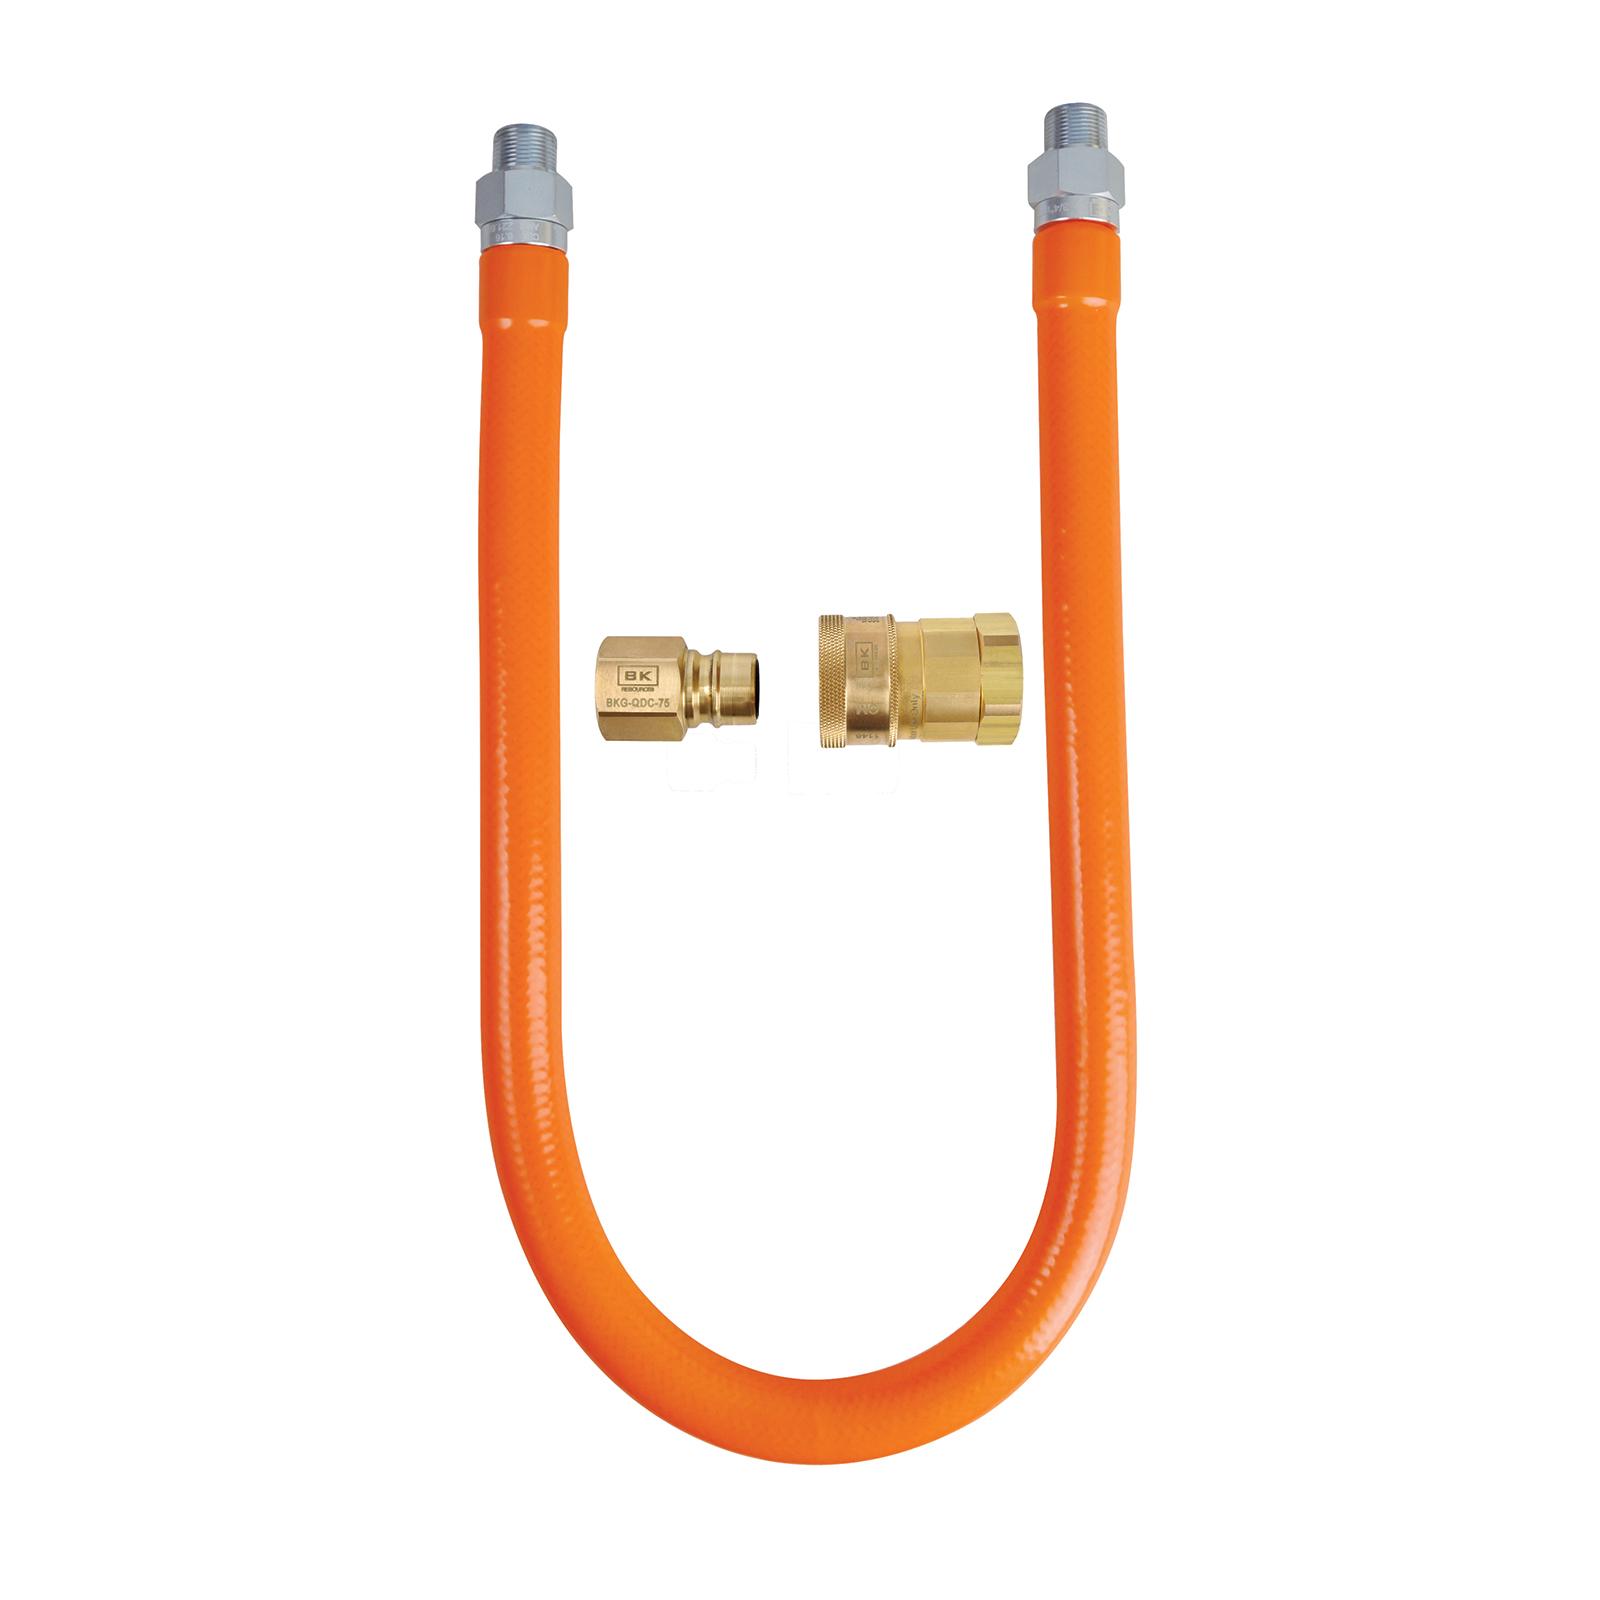 BK Resources BKG-GHC-10072-QD-PT gas connector hose kit